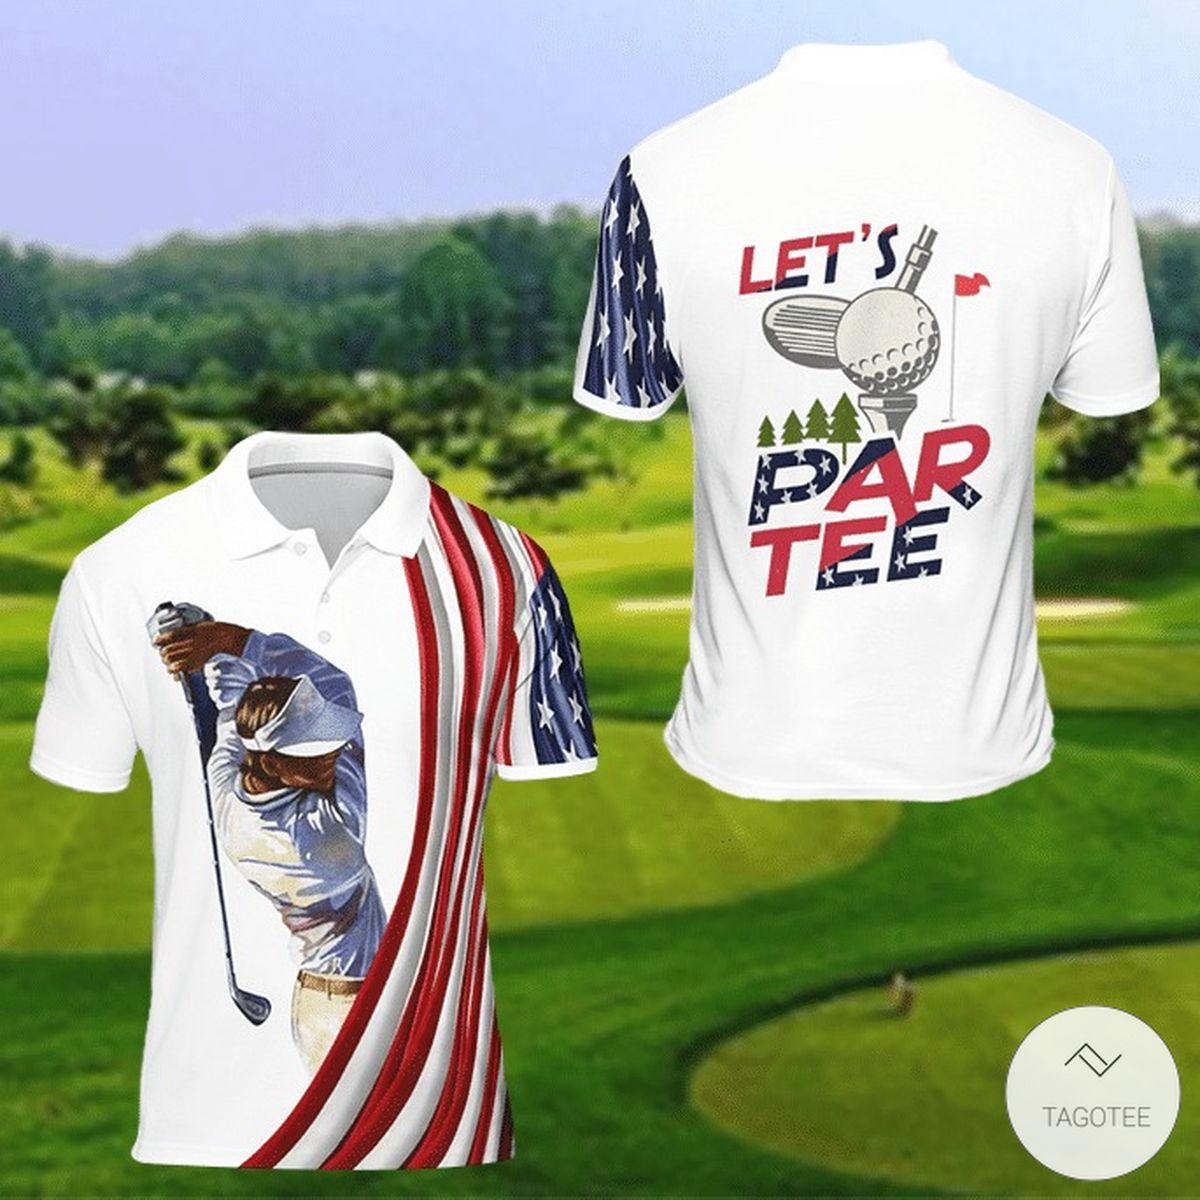 Let's Par Tee Golf Polo Shirt